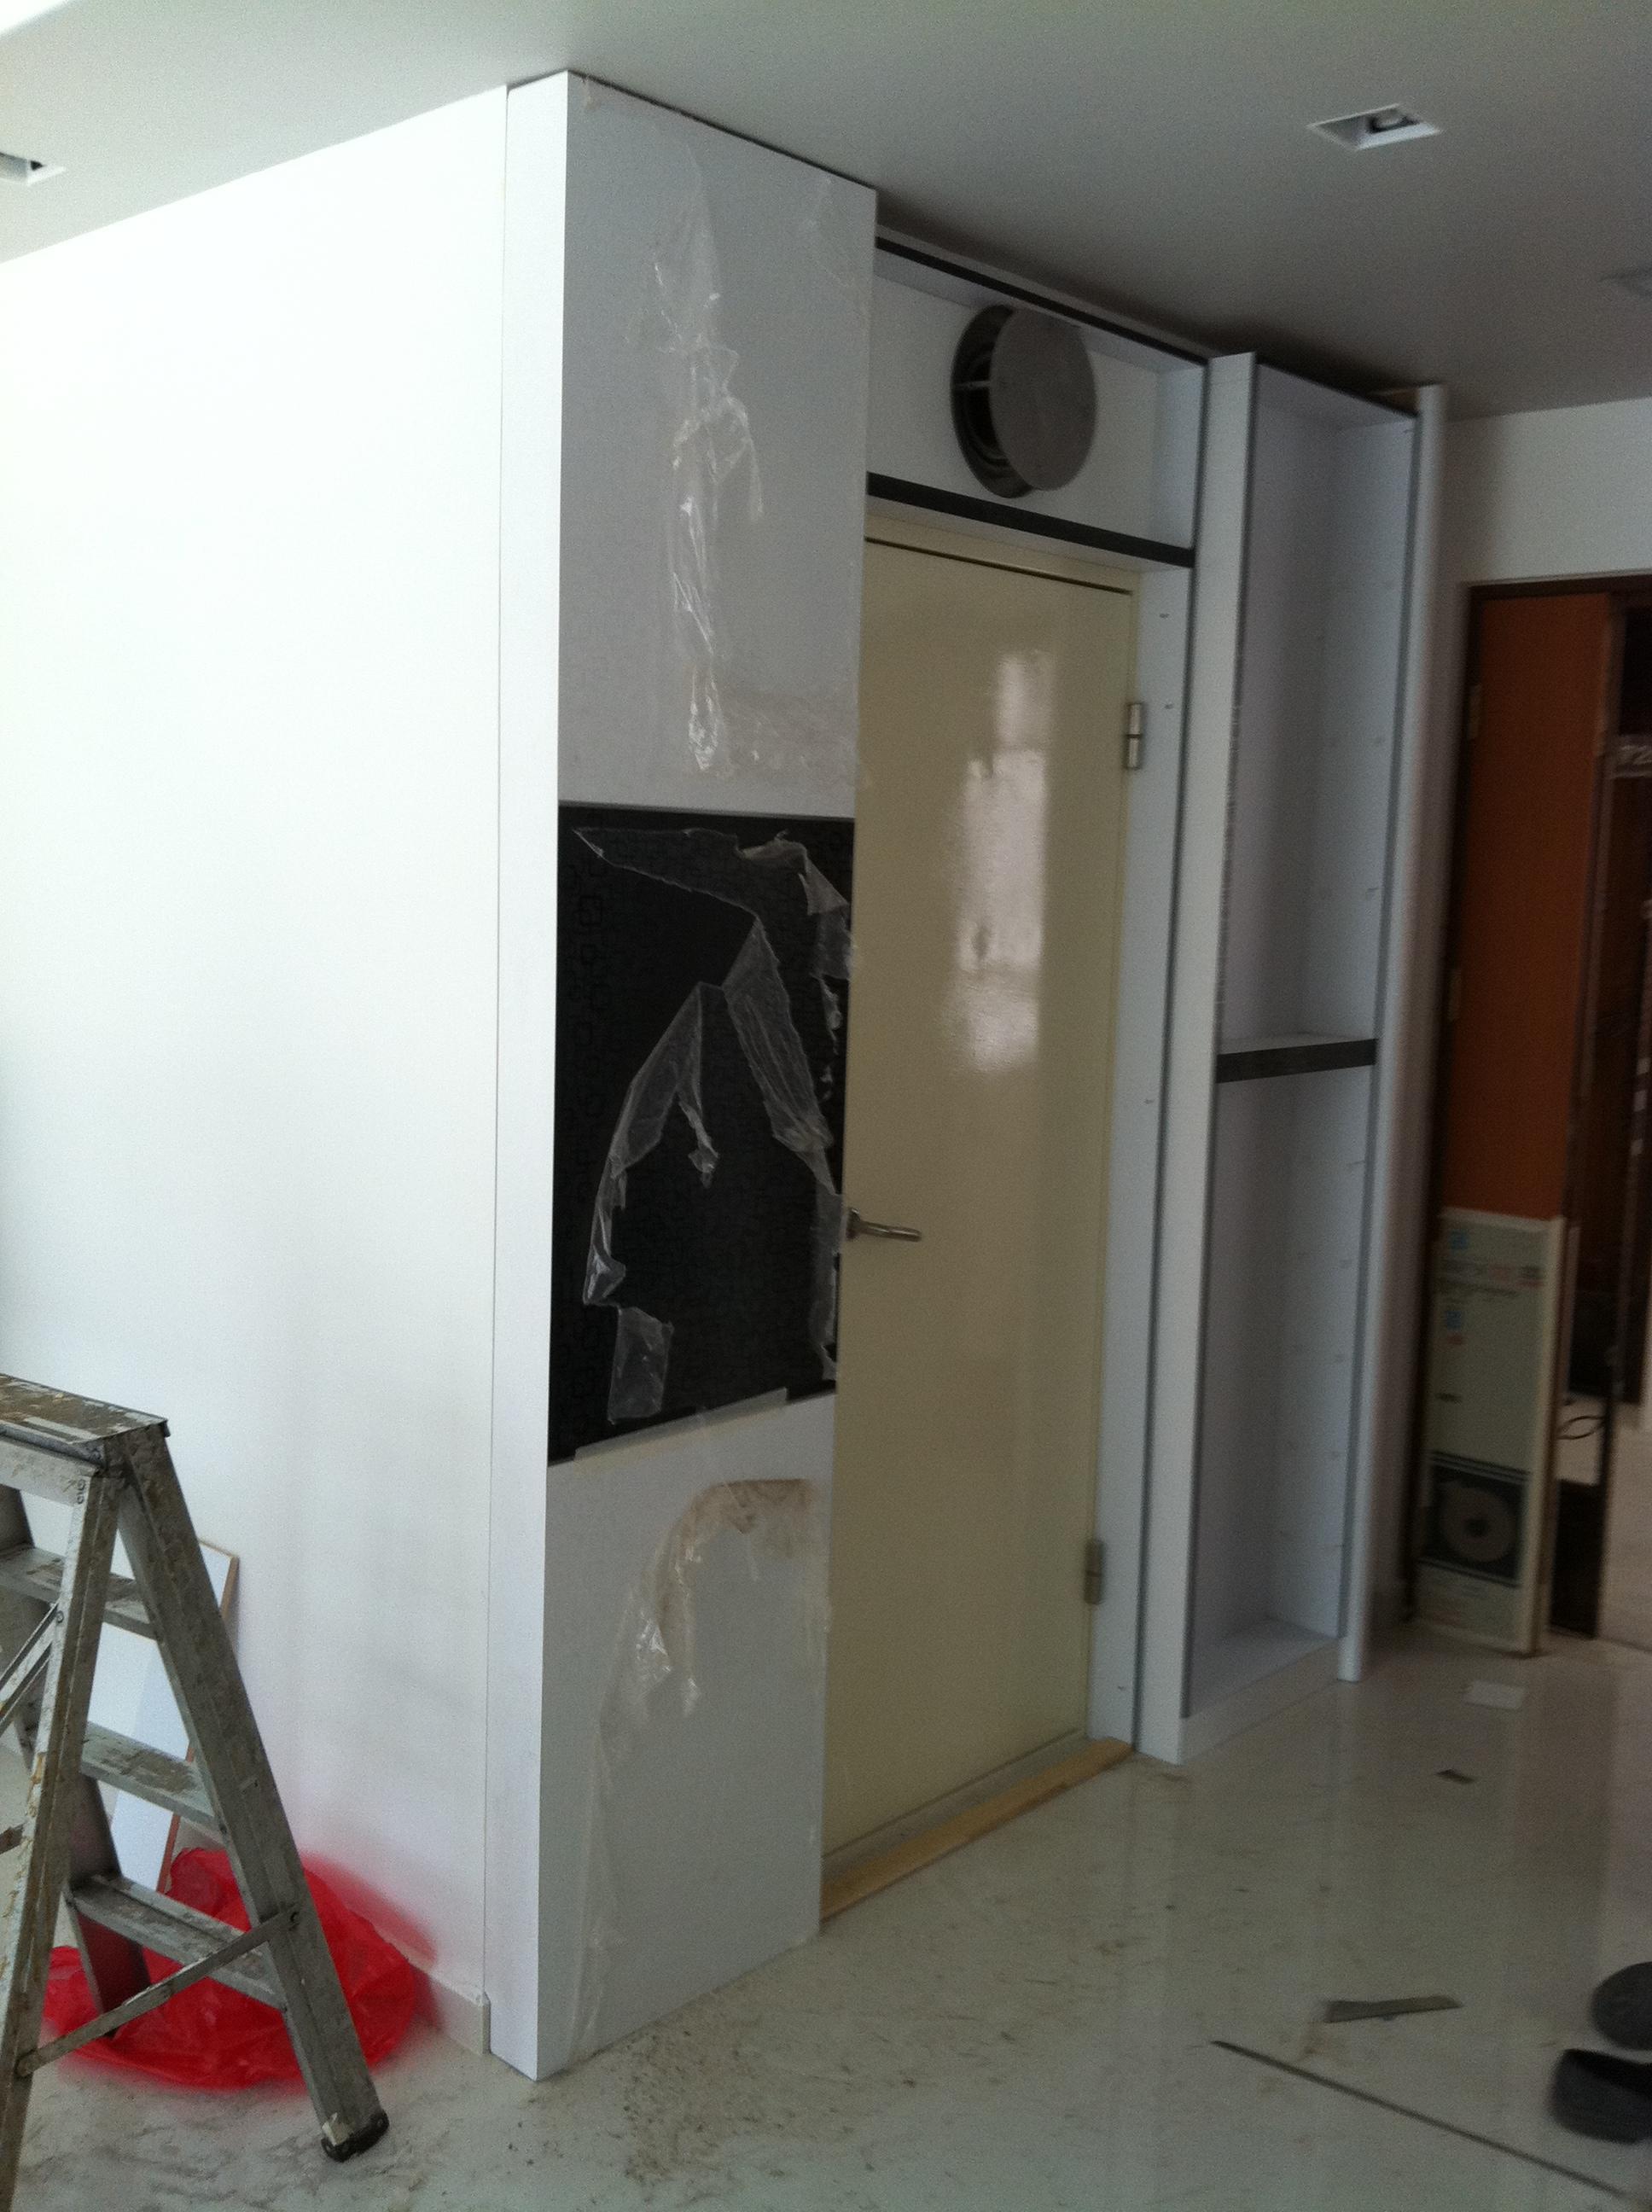 carpenter kitchen cabinet cabinets design renovation day 112 – 116 my fishing & reno blog